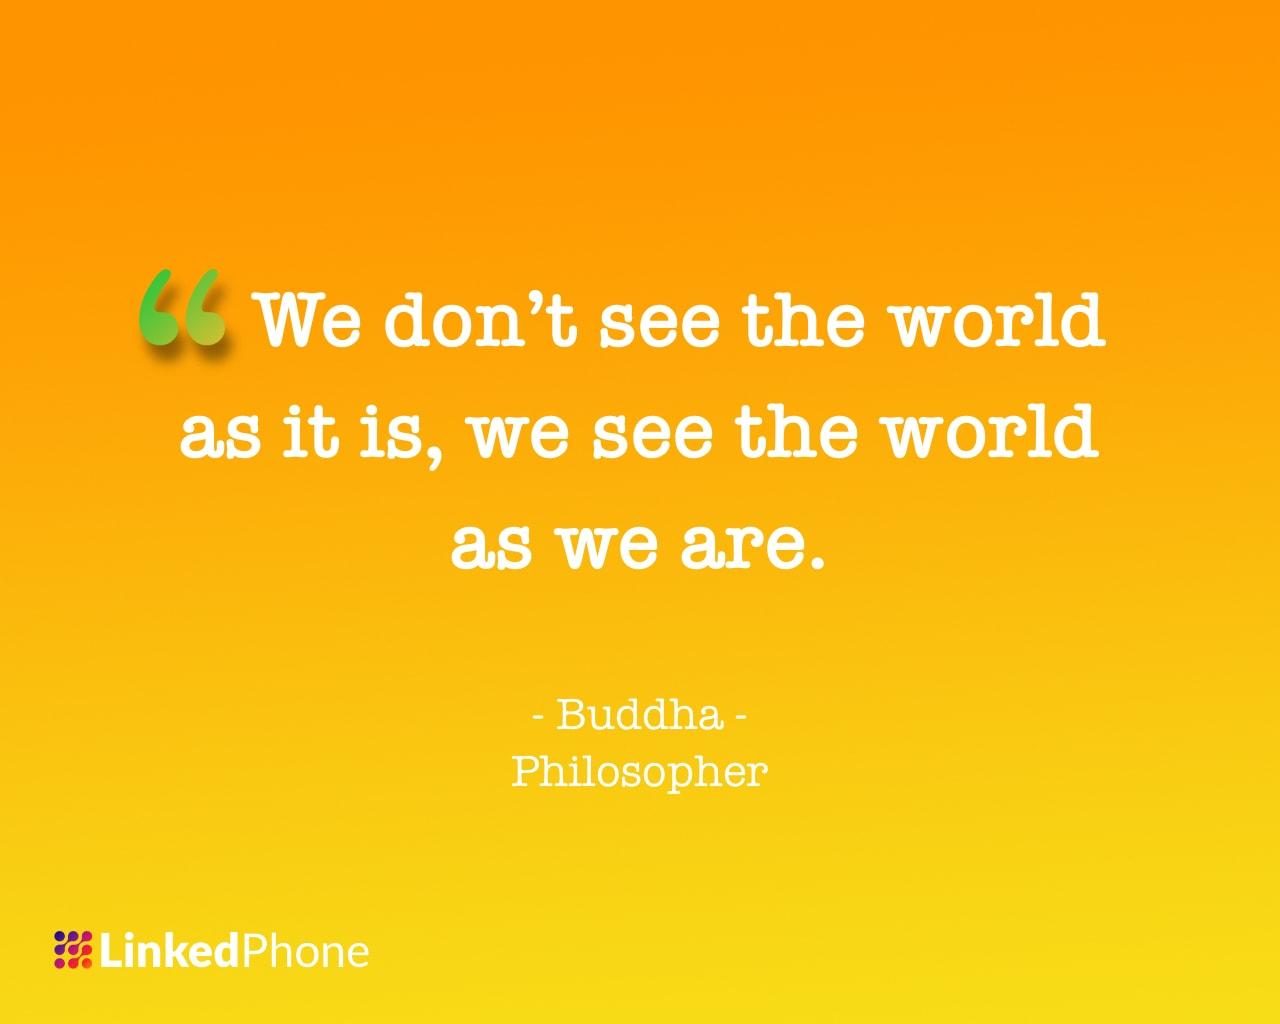 Buddha - Motivational Inspirational Quotes and Sayings